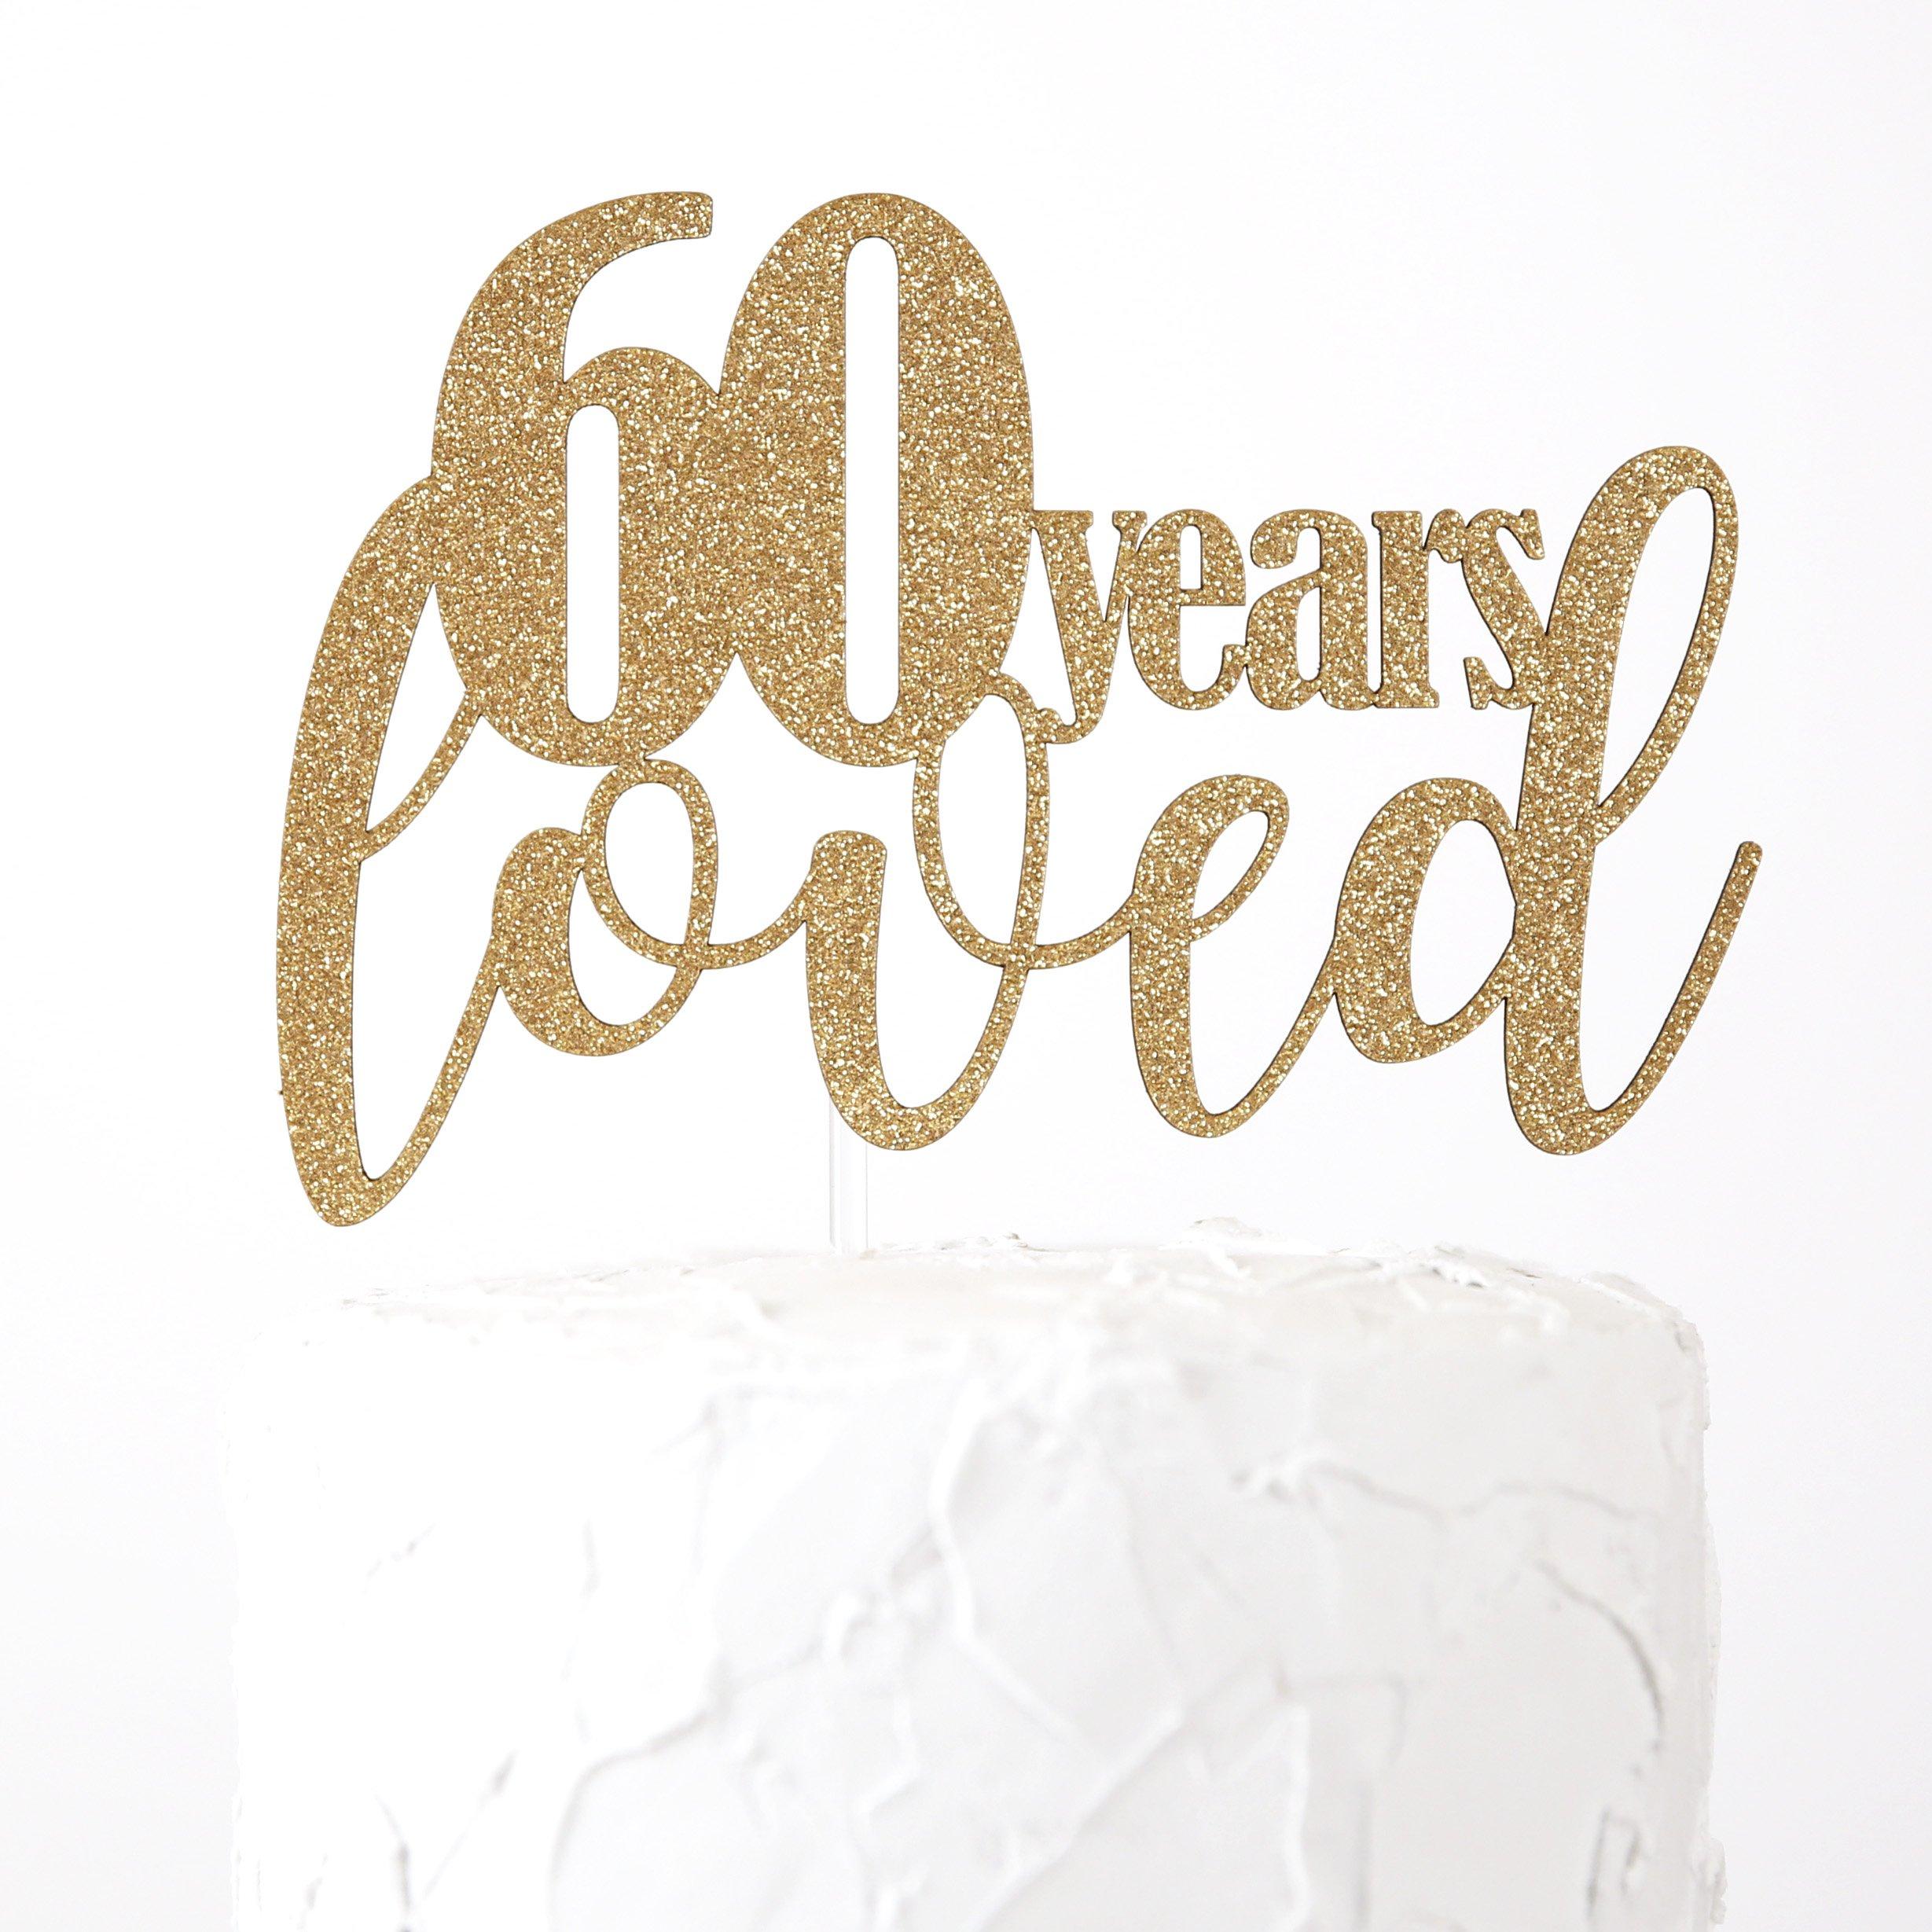 NANASUKO 60th Birthday/Anniversary Cake Topper - 60 years loved - Premium quality Made in USA - gold glitter